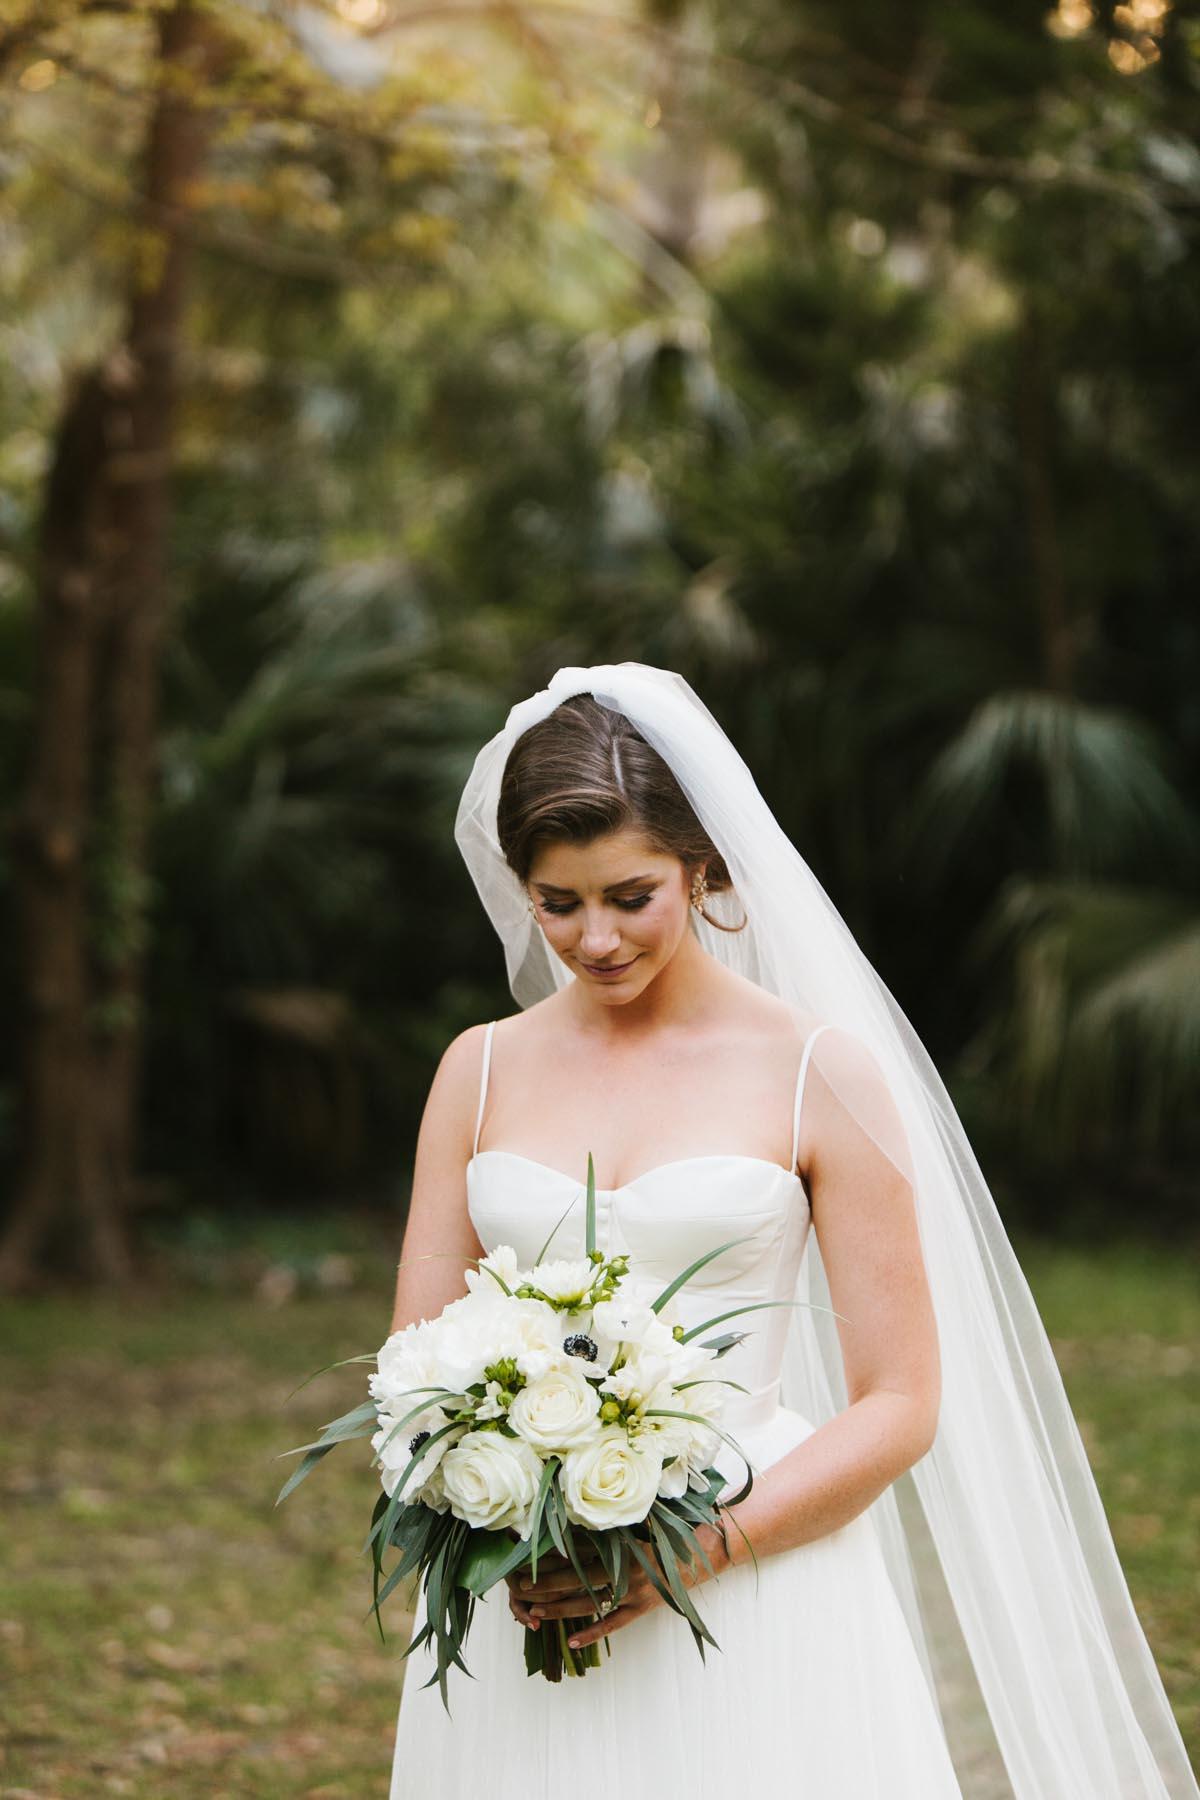 lowry wedding blog eden garden florida wedding-90